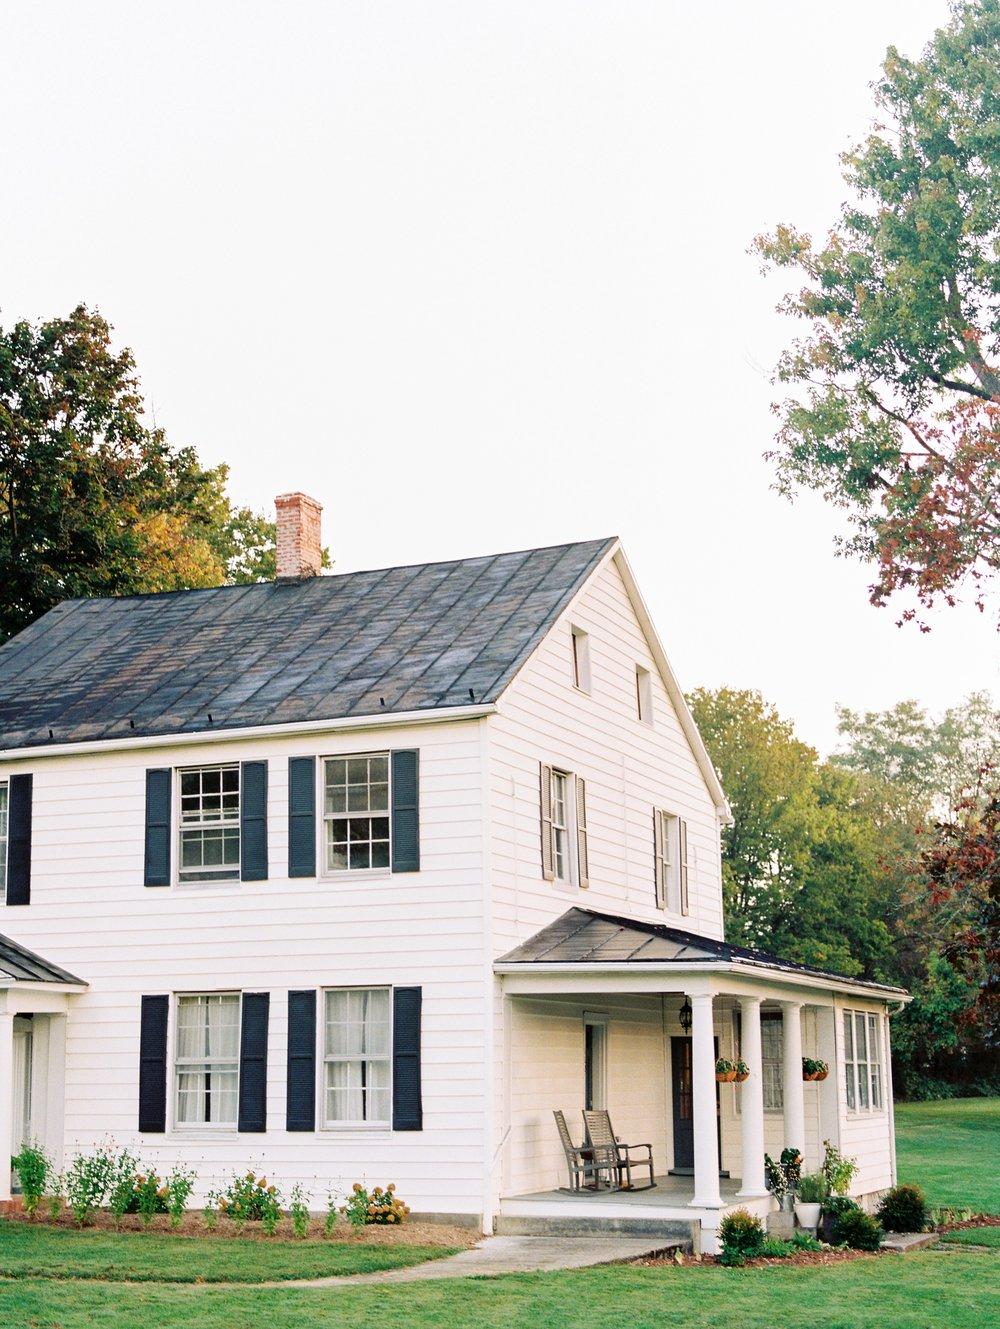 stylerefinedco_farmhouse1851-_0001.jpg